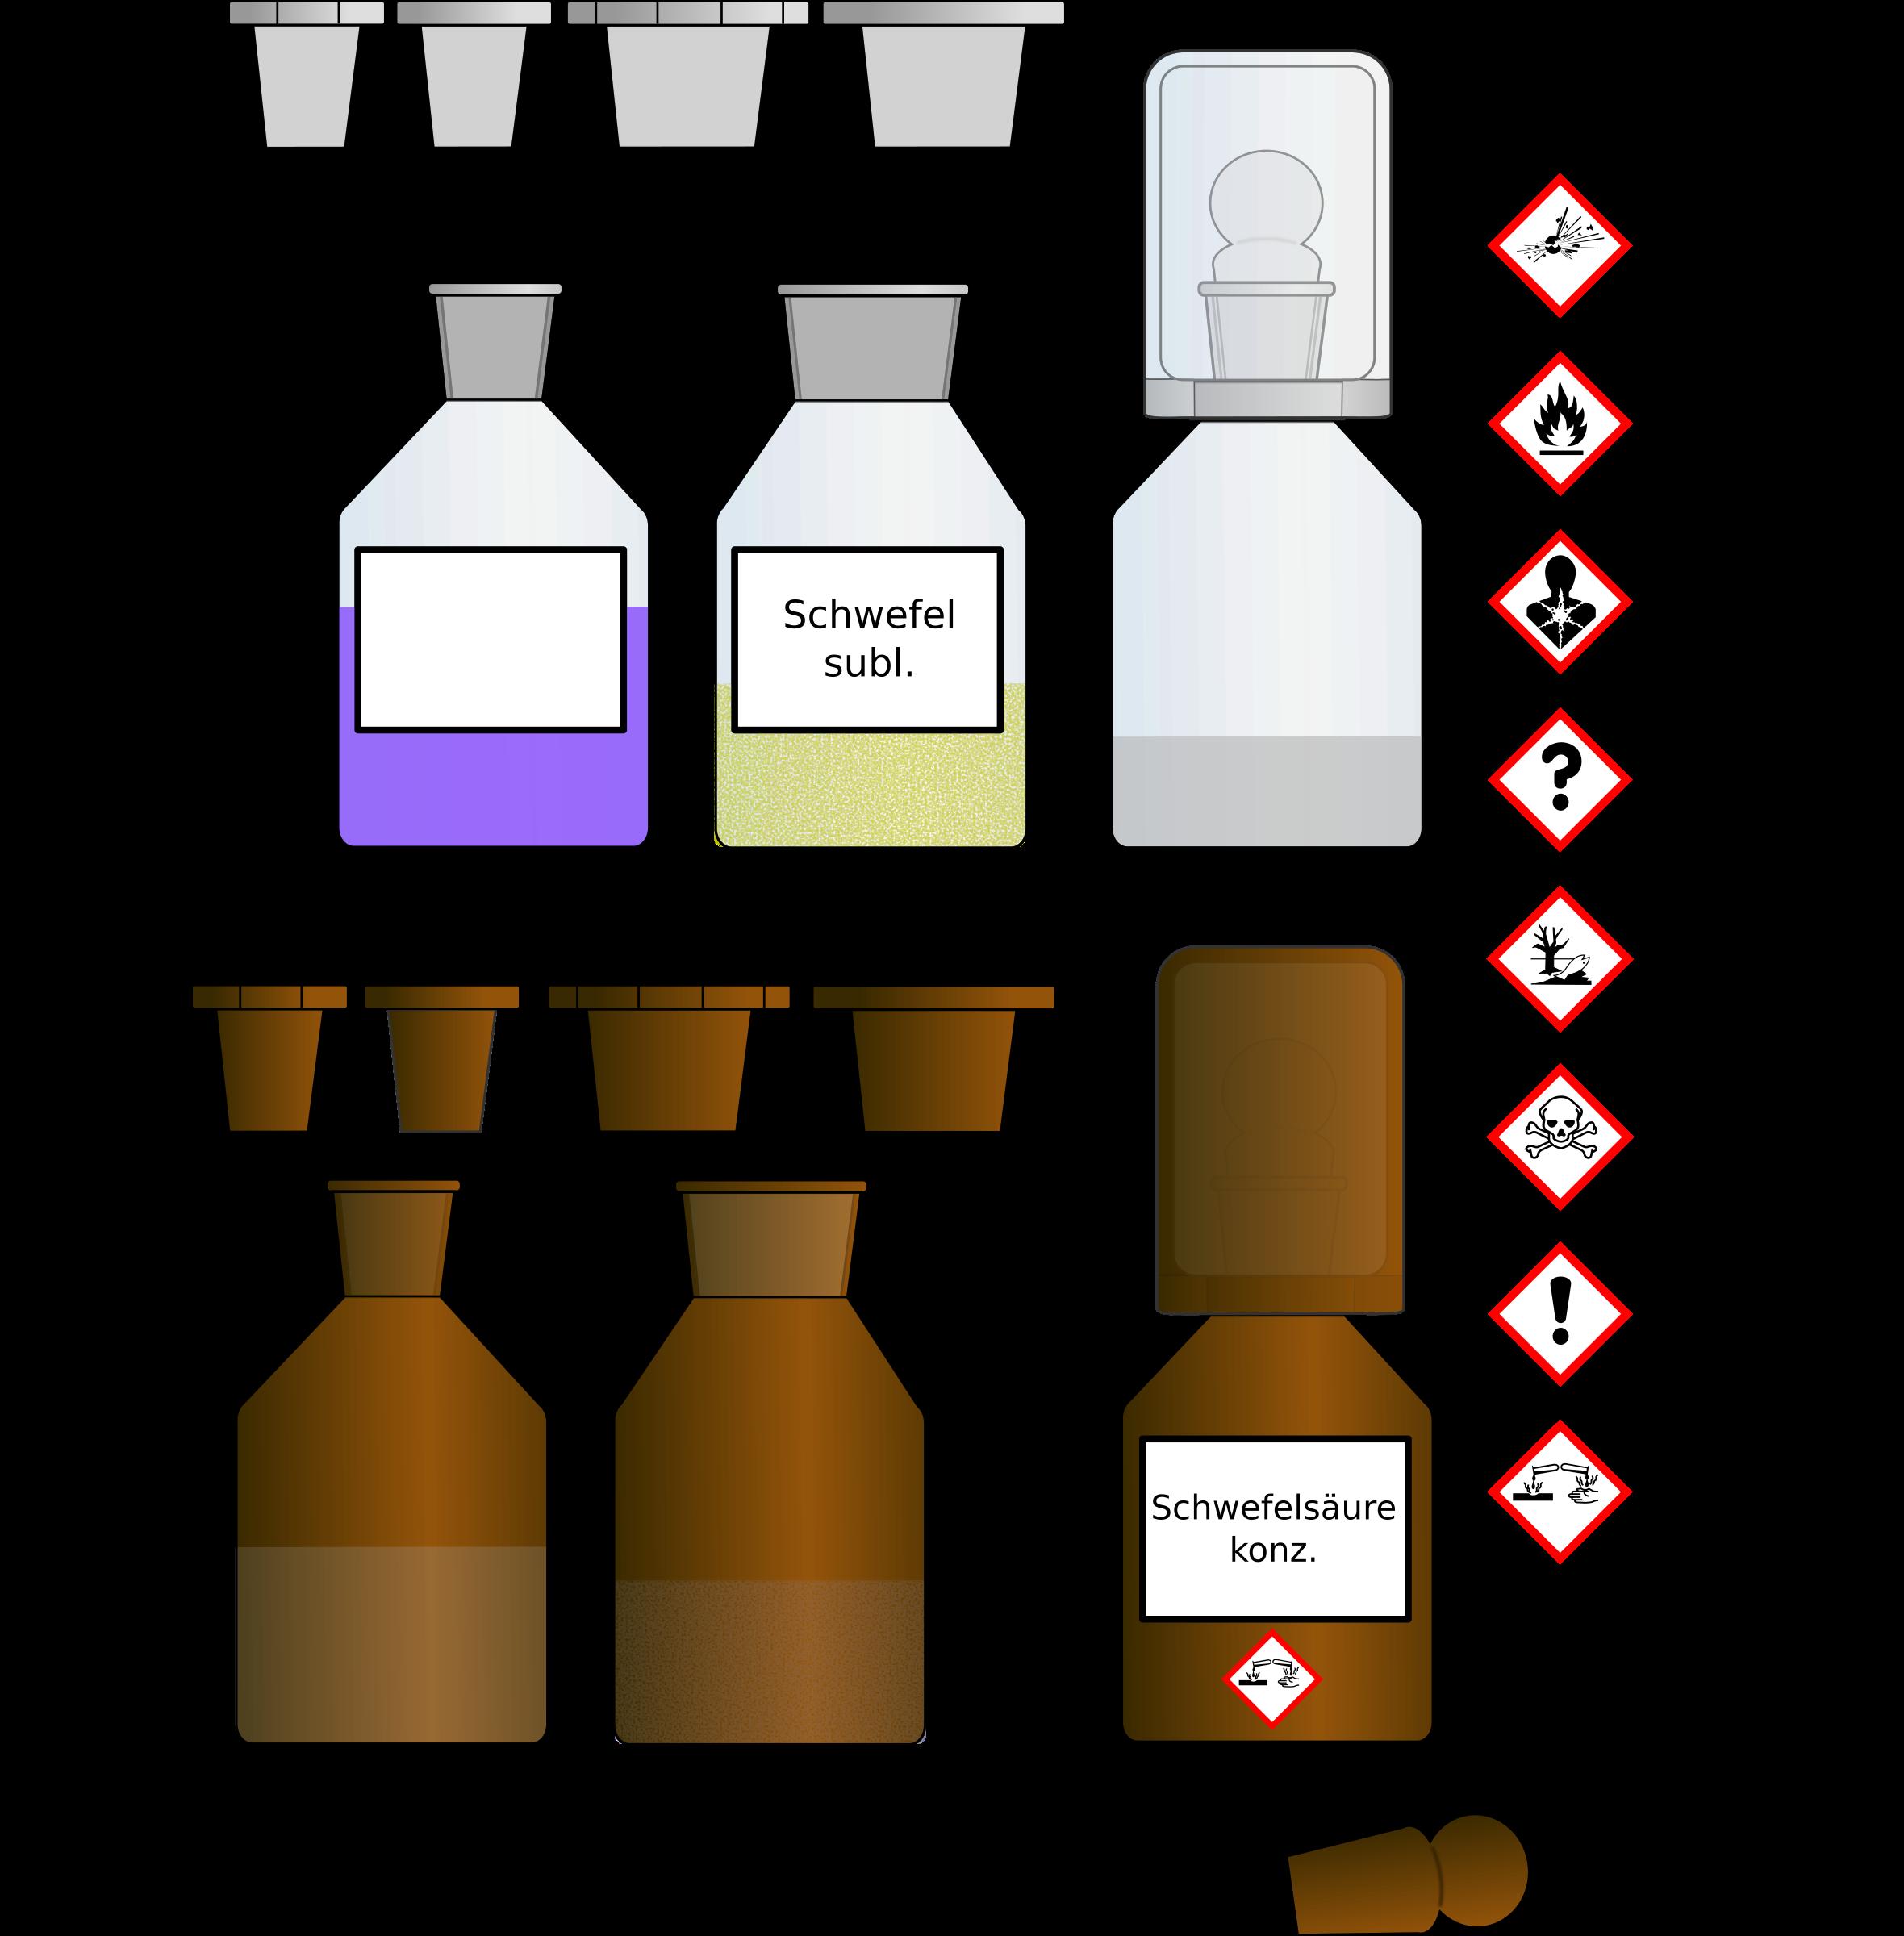 Chemical clipart bottle. Chemikalien flaschen bottles big